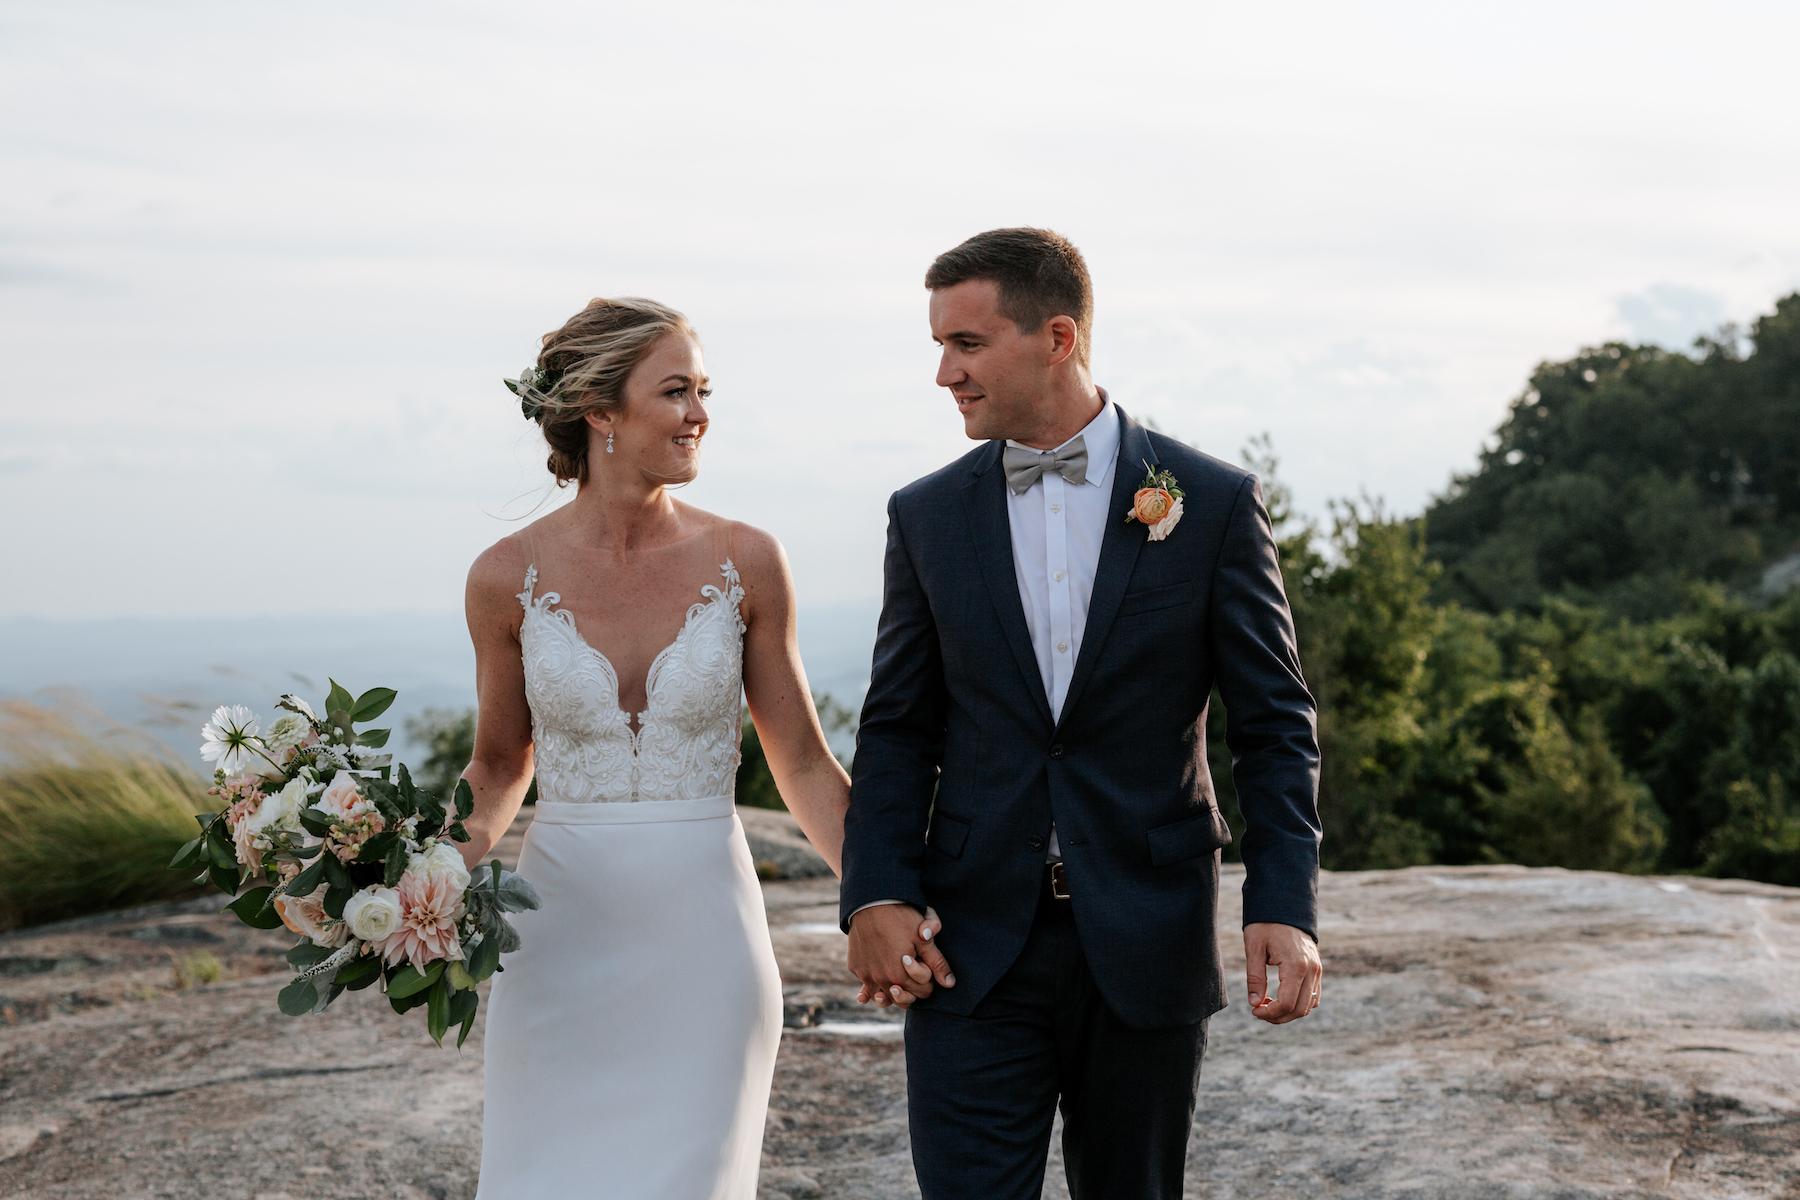 wedding-engagement-photographer-spartanburg-greenville-columbia-carolina-south-north-532.JPG